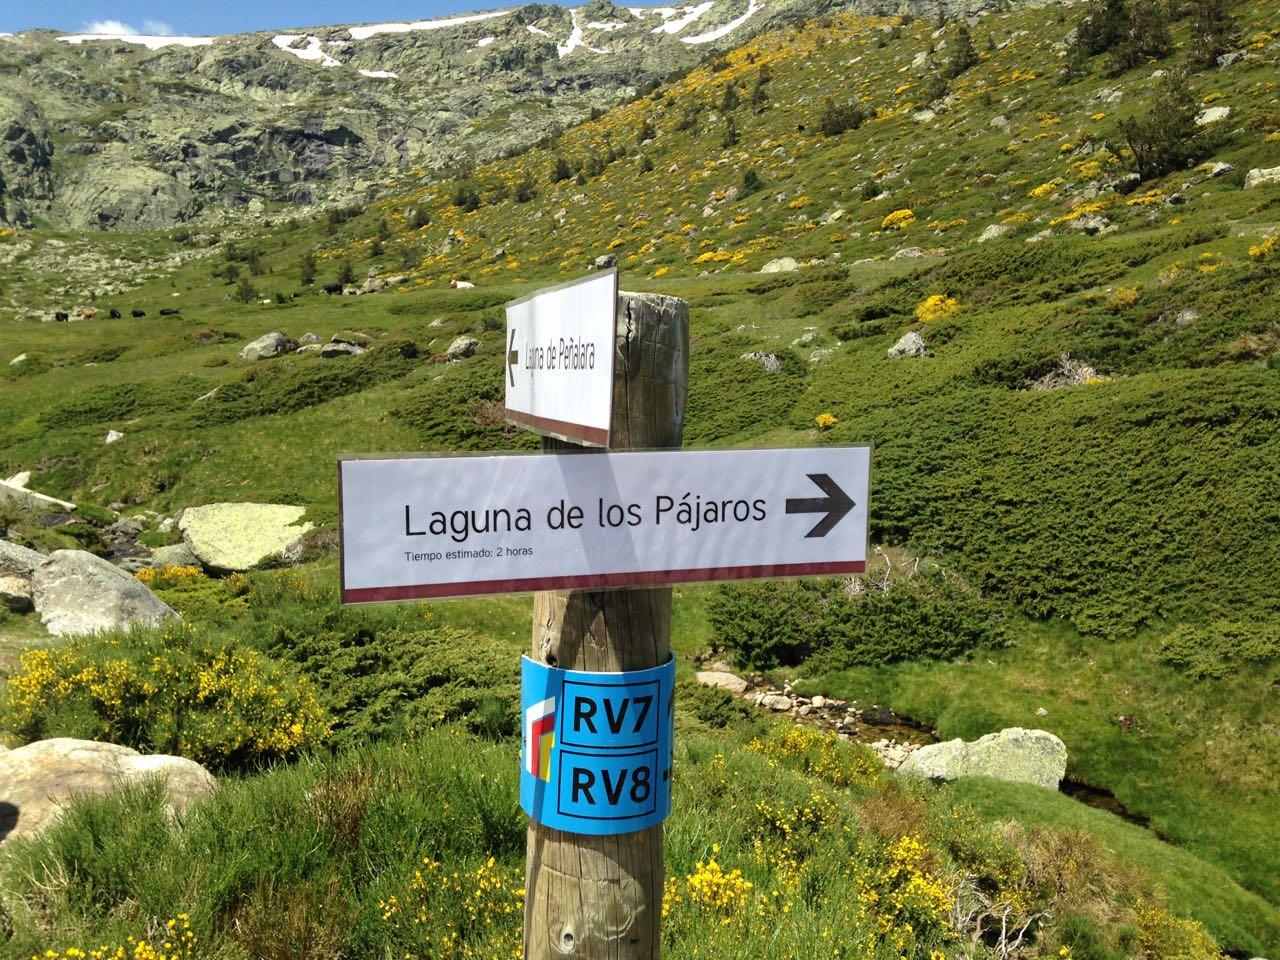 Wegweiser zur Laguna des los Pajaros.